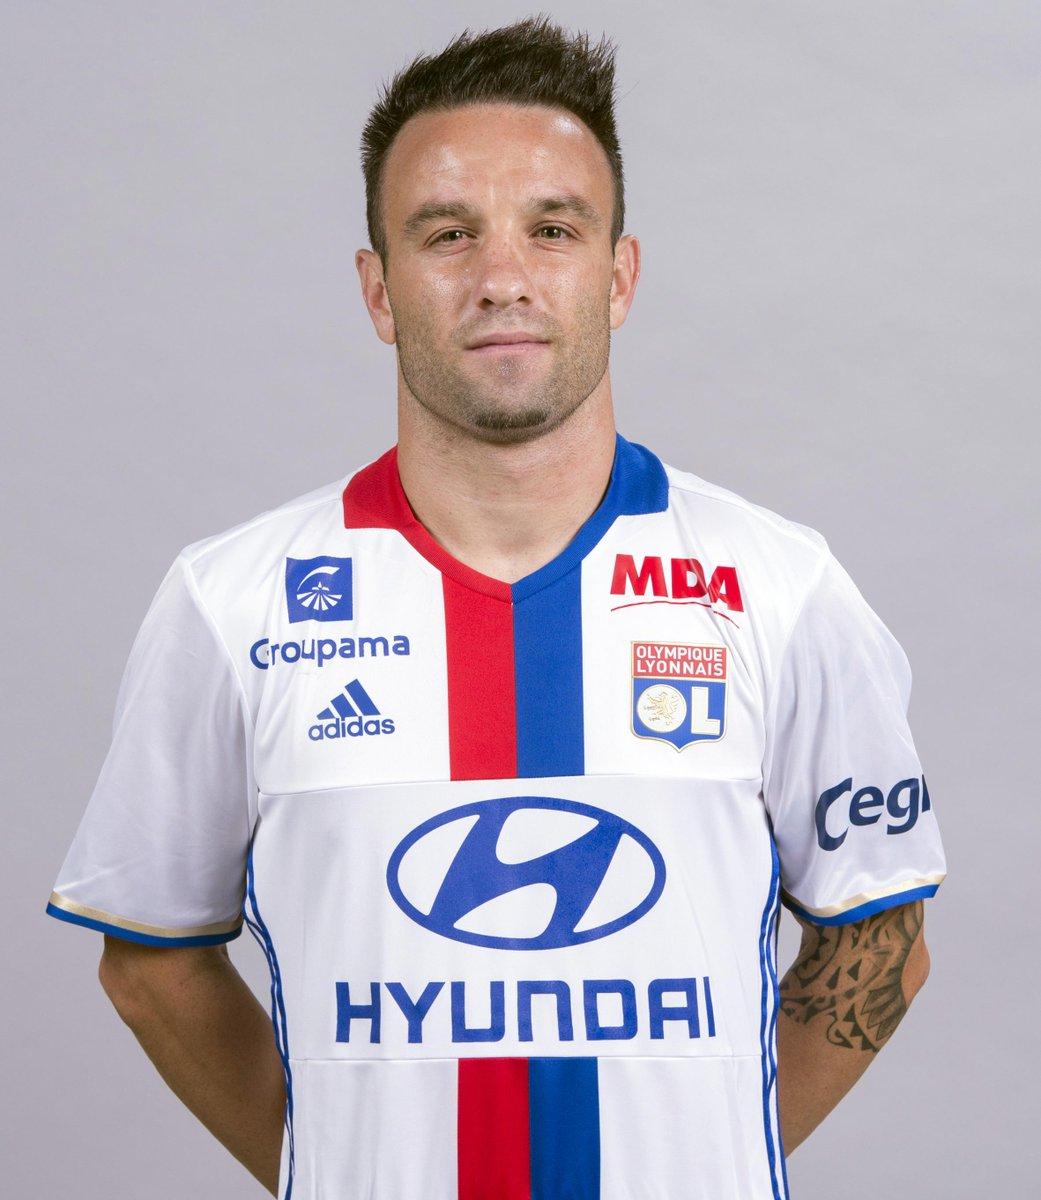 "Olympique Lyonnais on Twitter ""Joyeux anniversaire Mathieu"